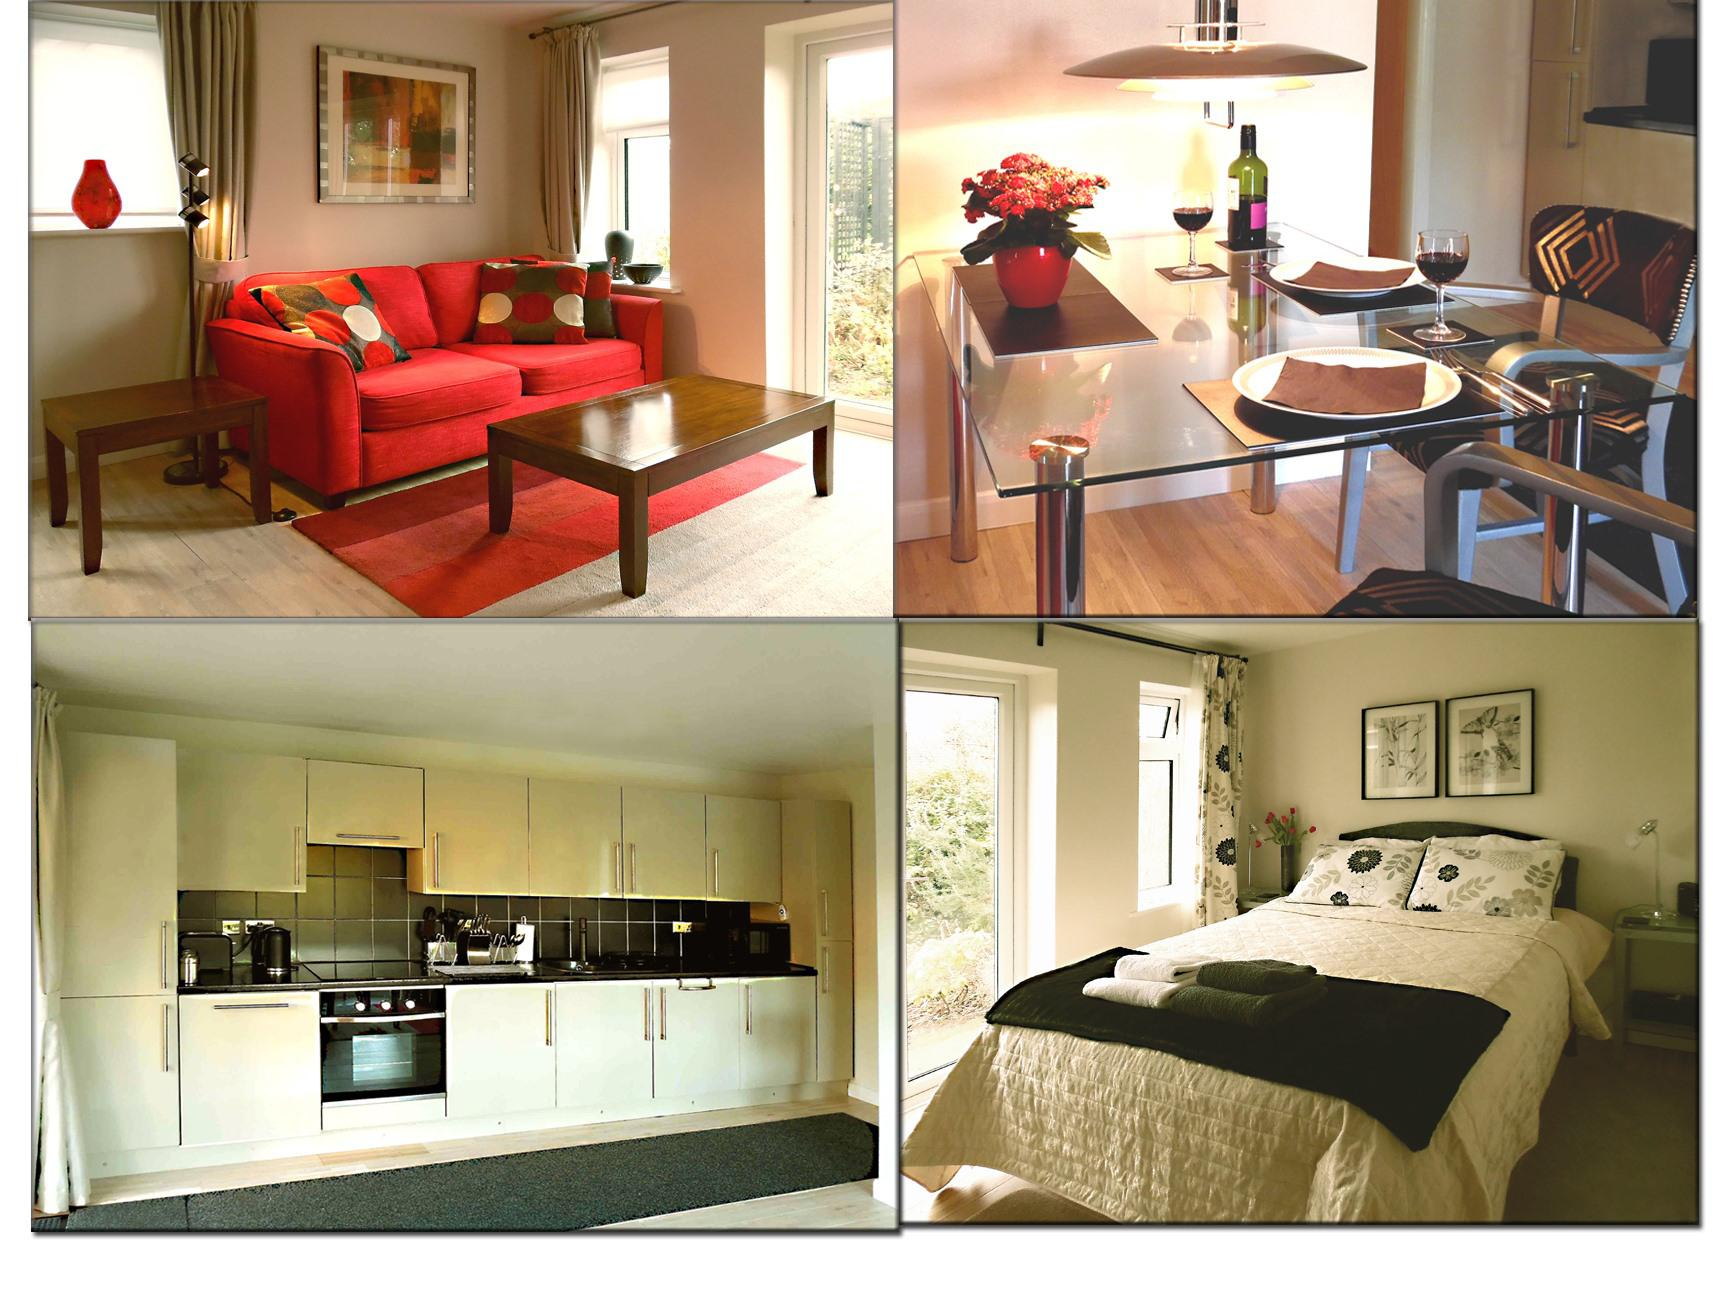 1 Bedroom Garden Cottage - up to 2 people